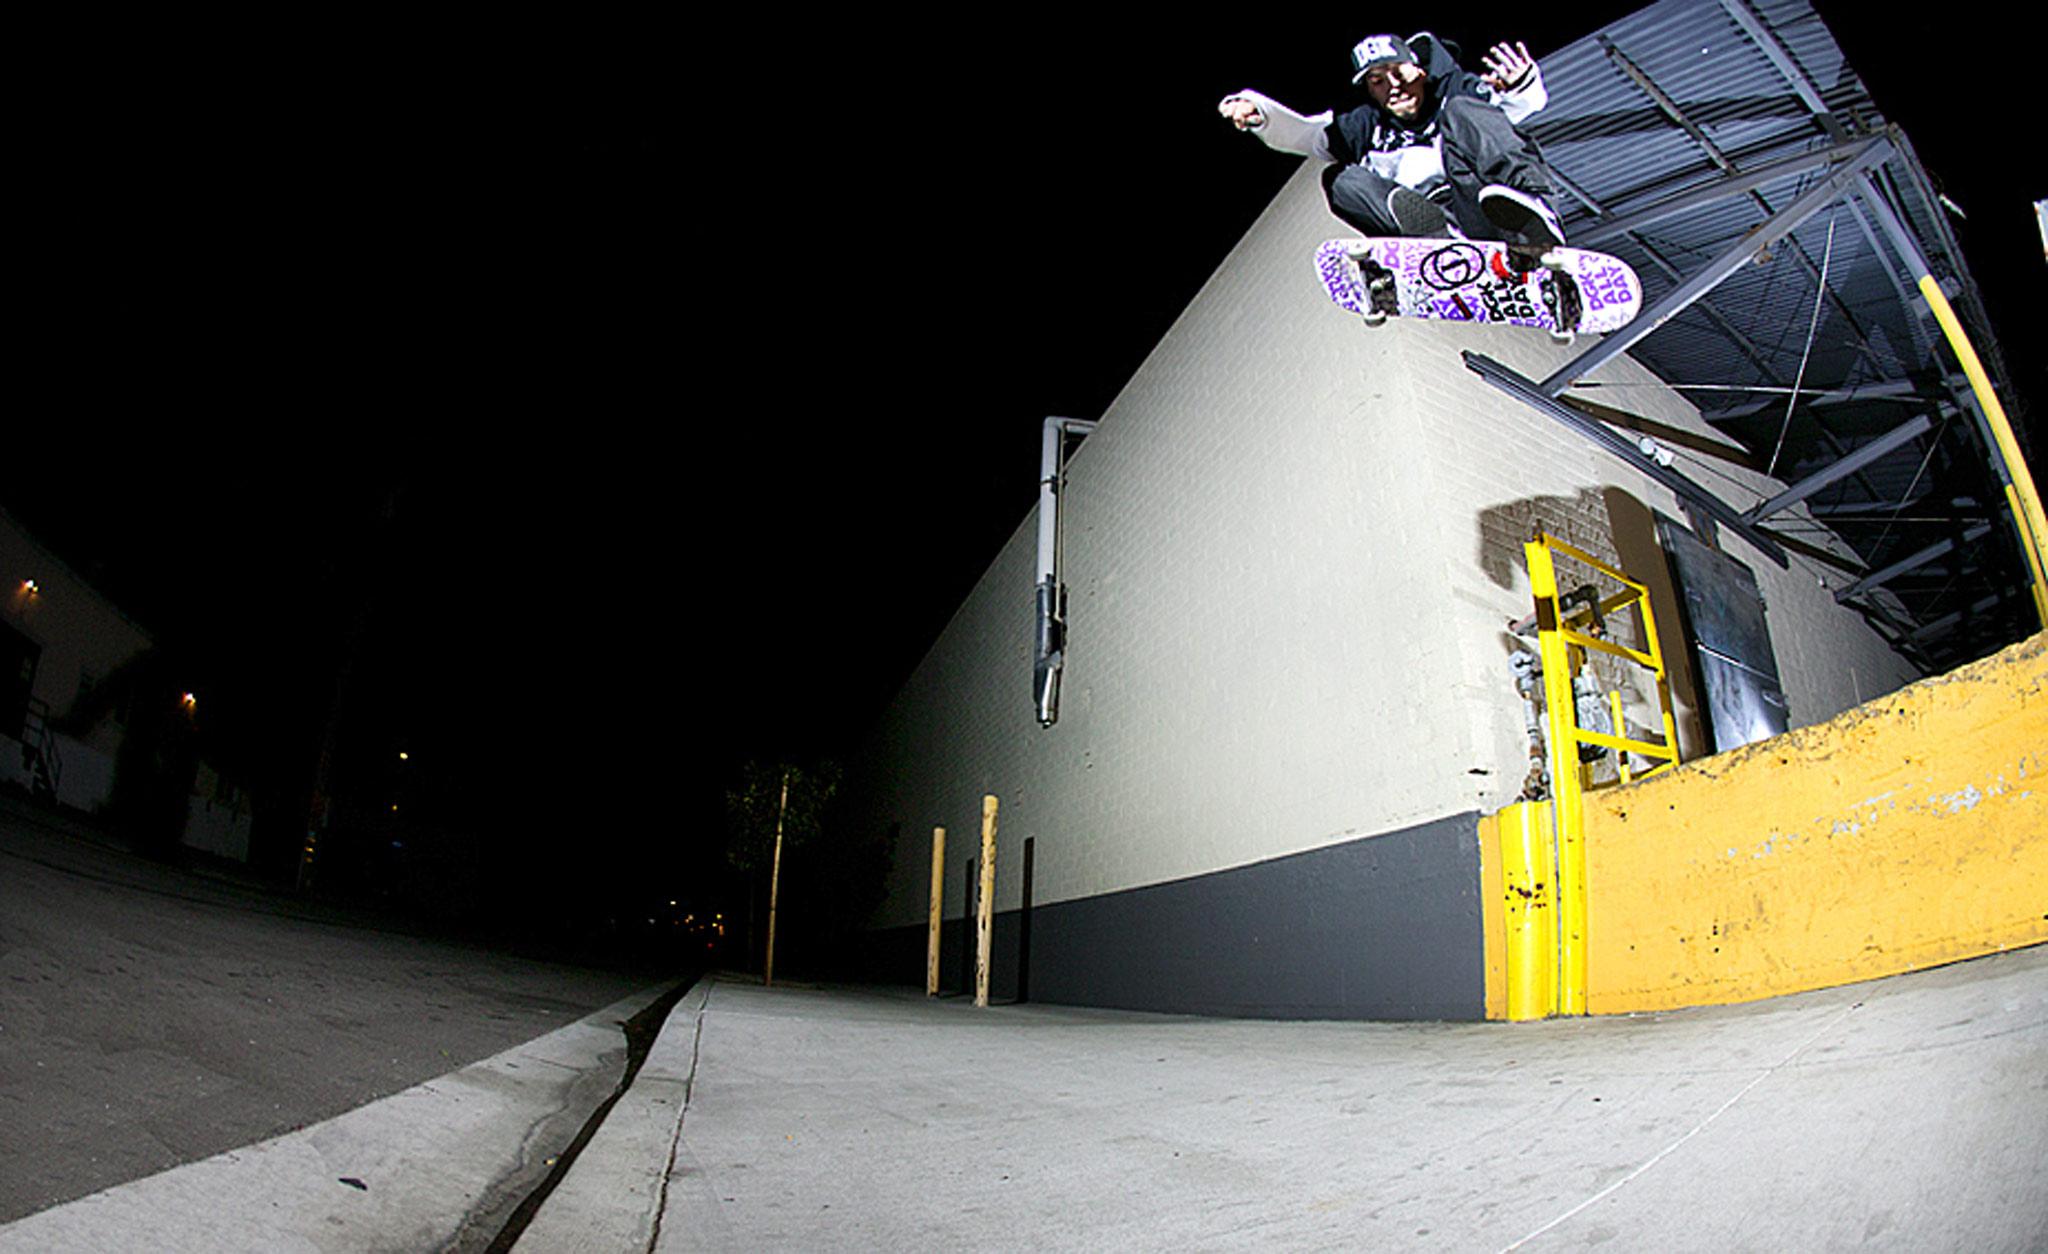 Lenny Rivas, Frontside Bigspin